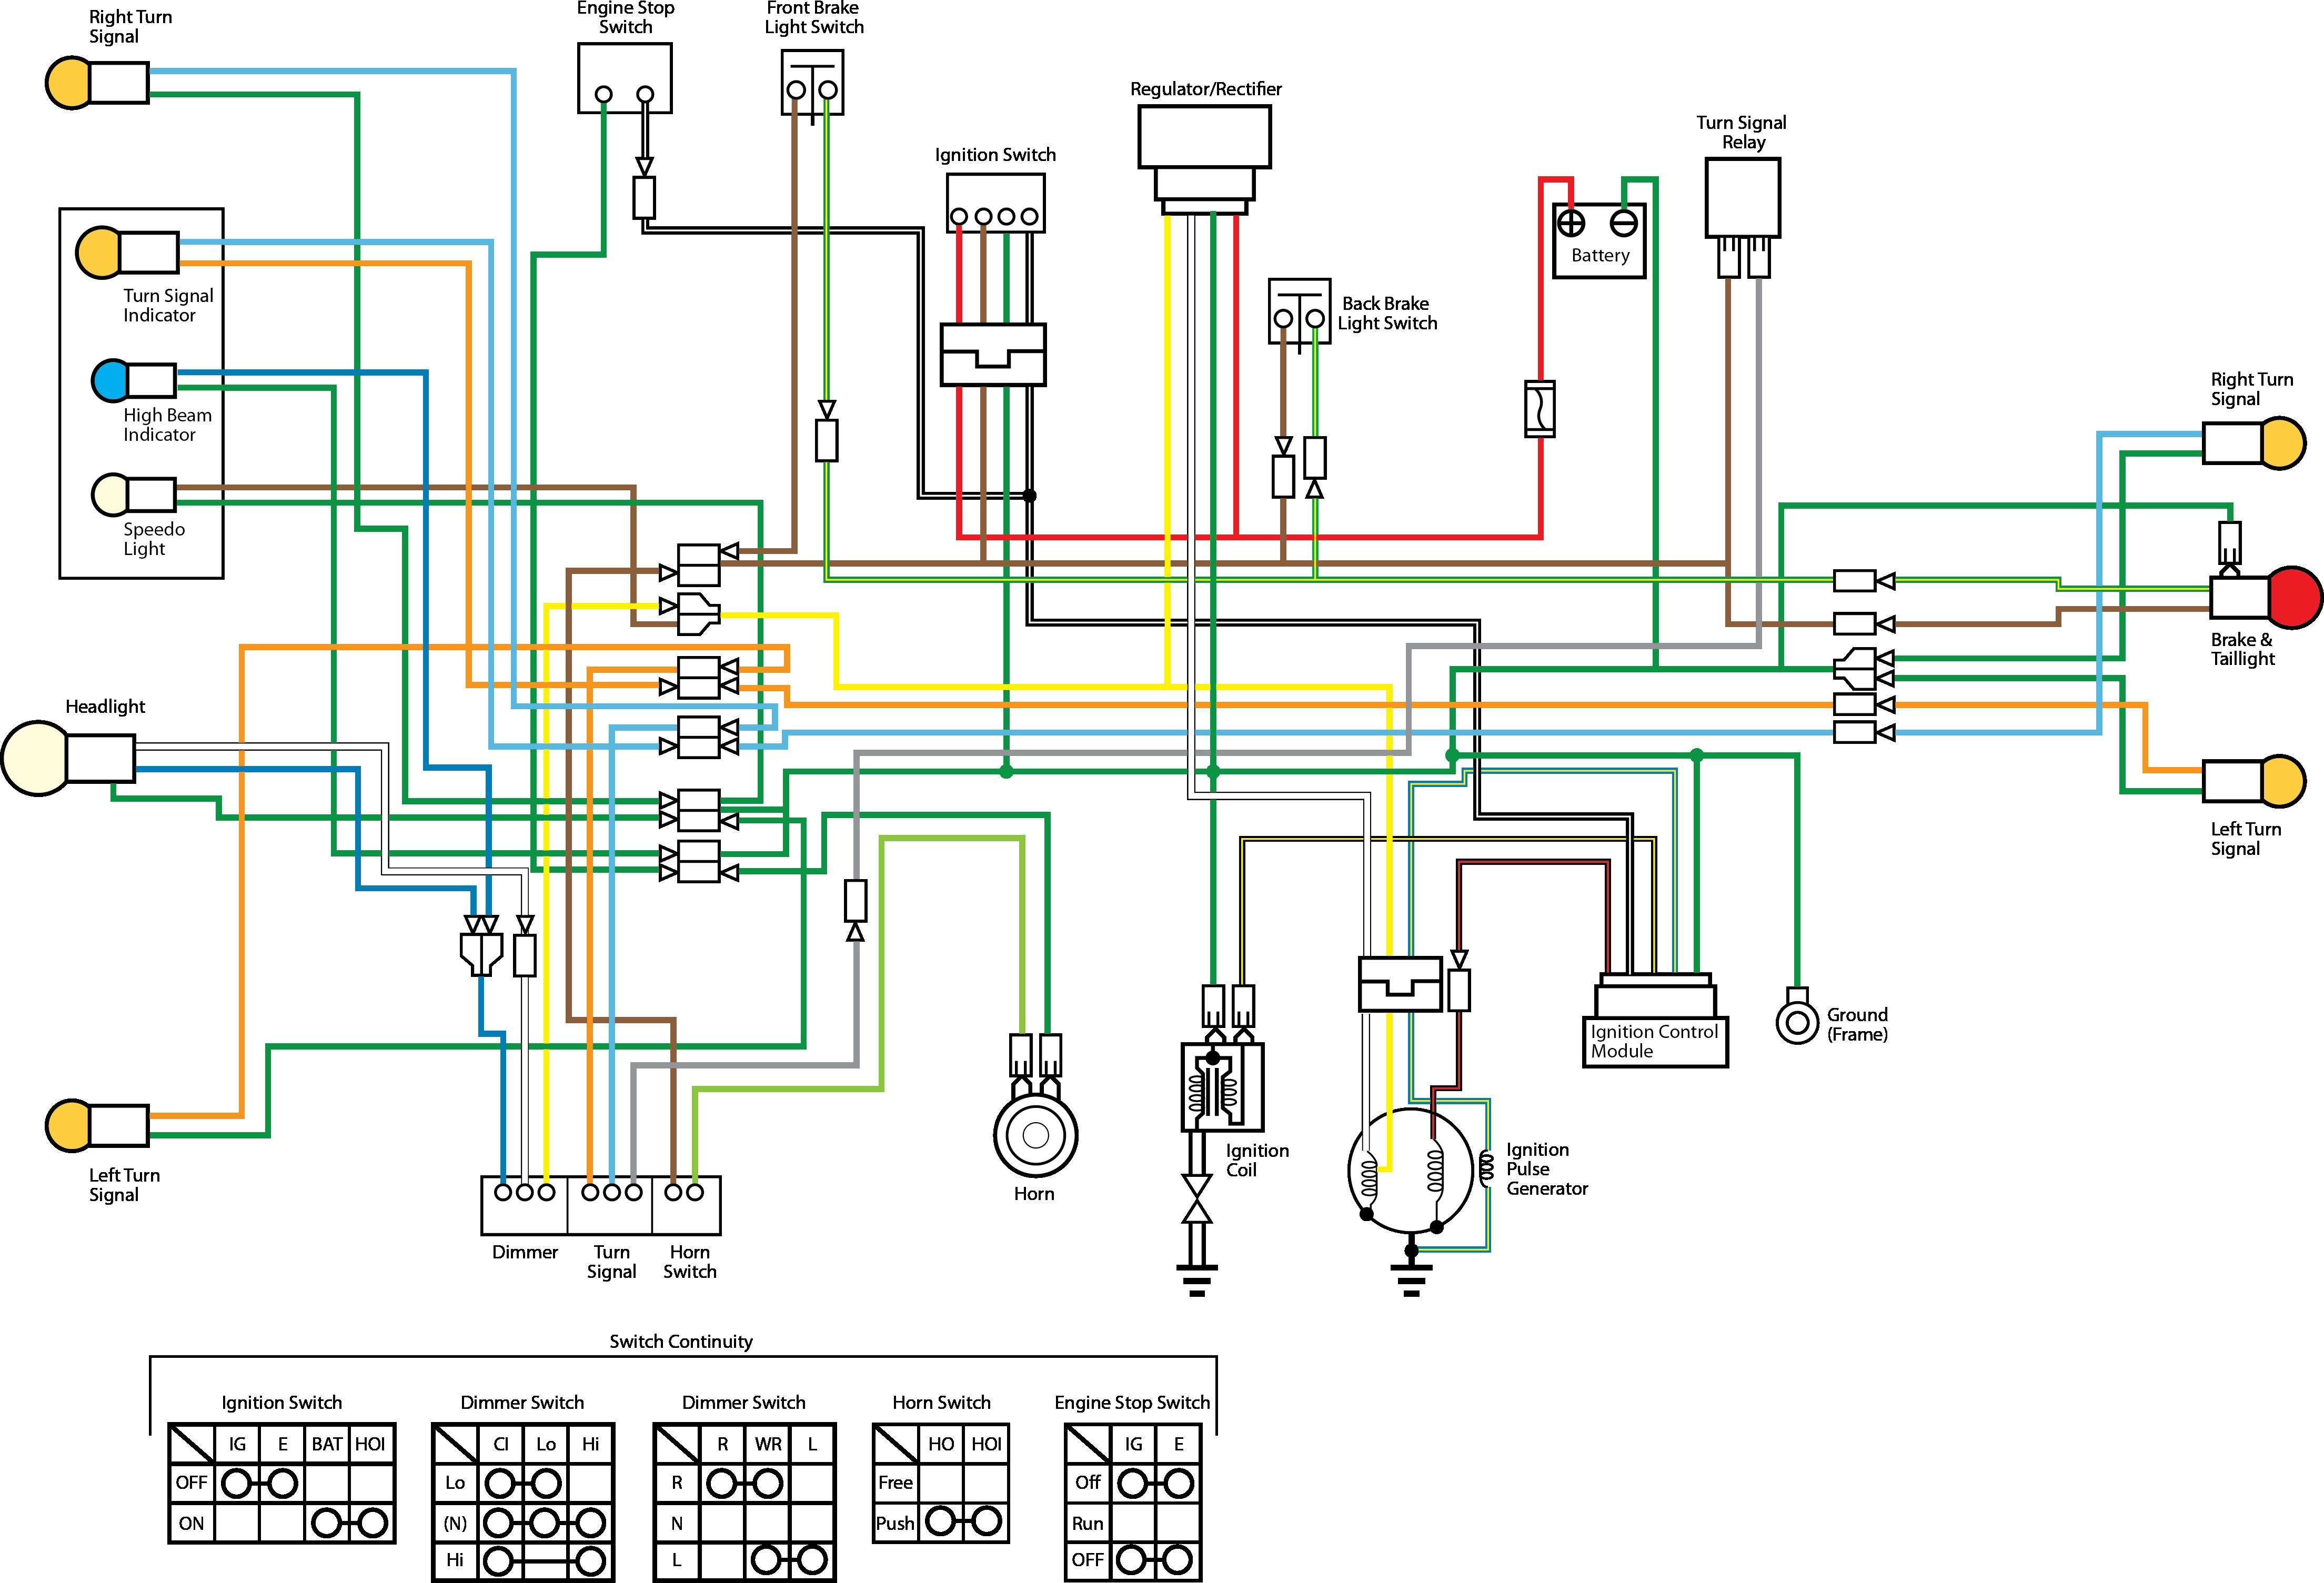 Free Car Wiring Diagrams Xl125 Wiring Diagram Wiring Diagram Pass Of Free Car Wiring Diagrams